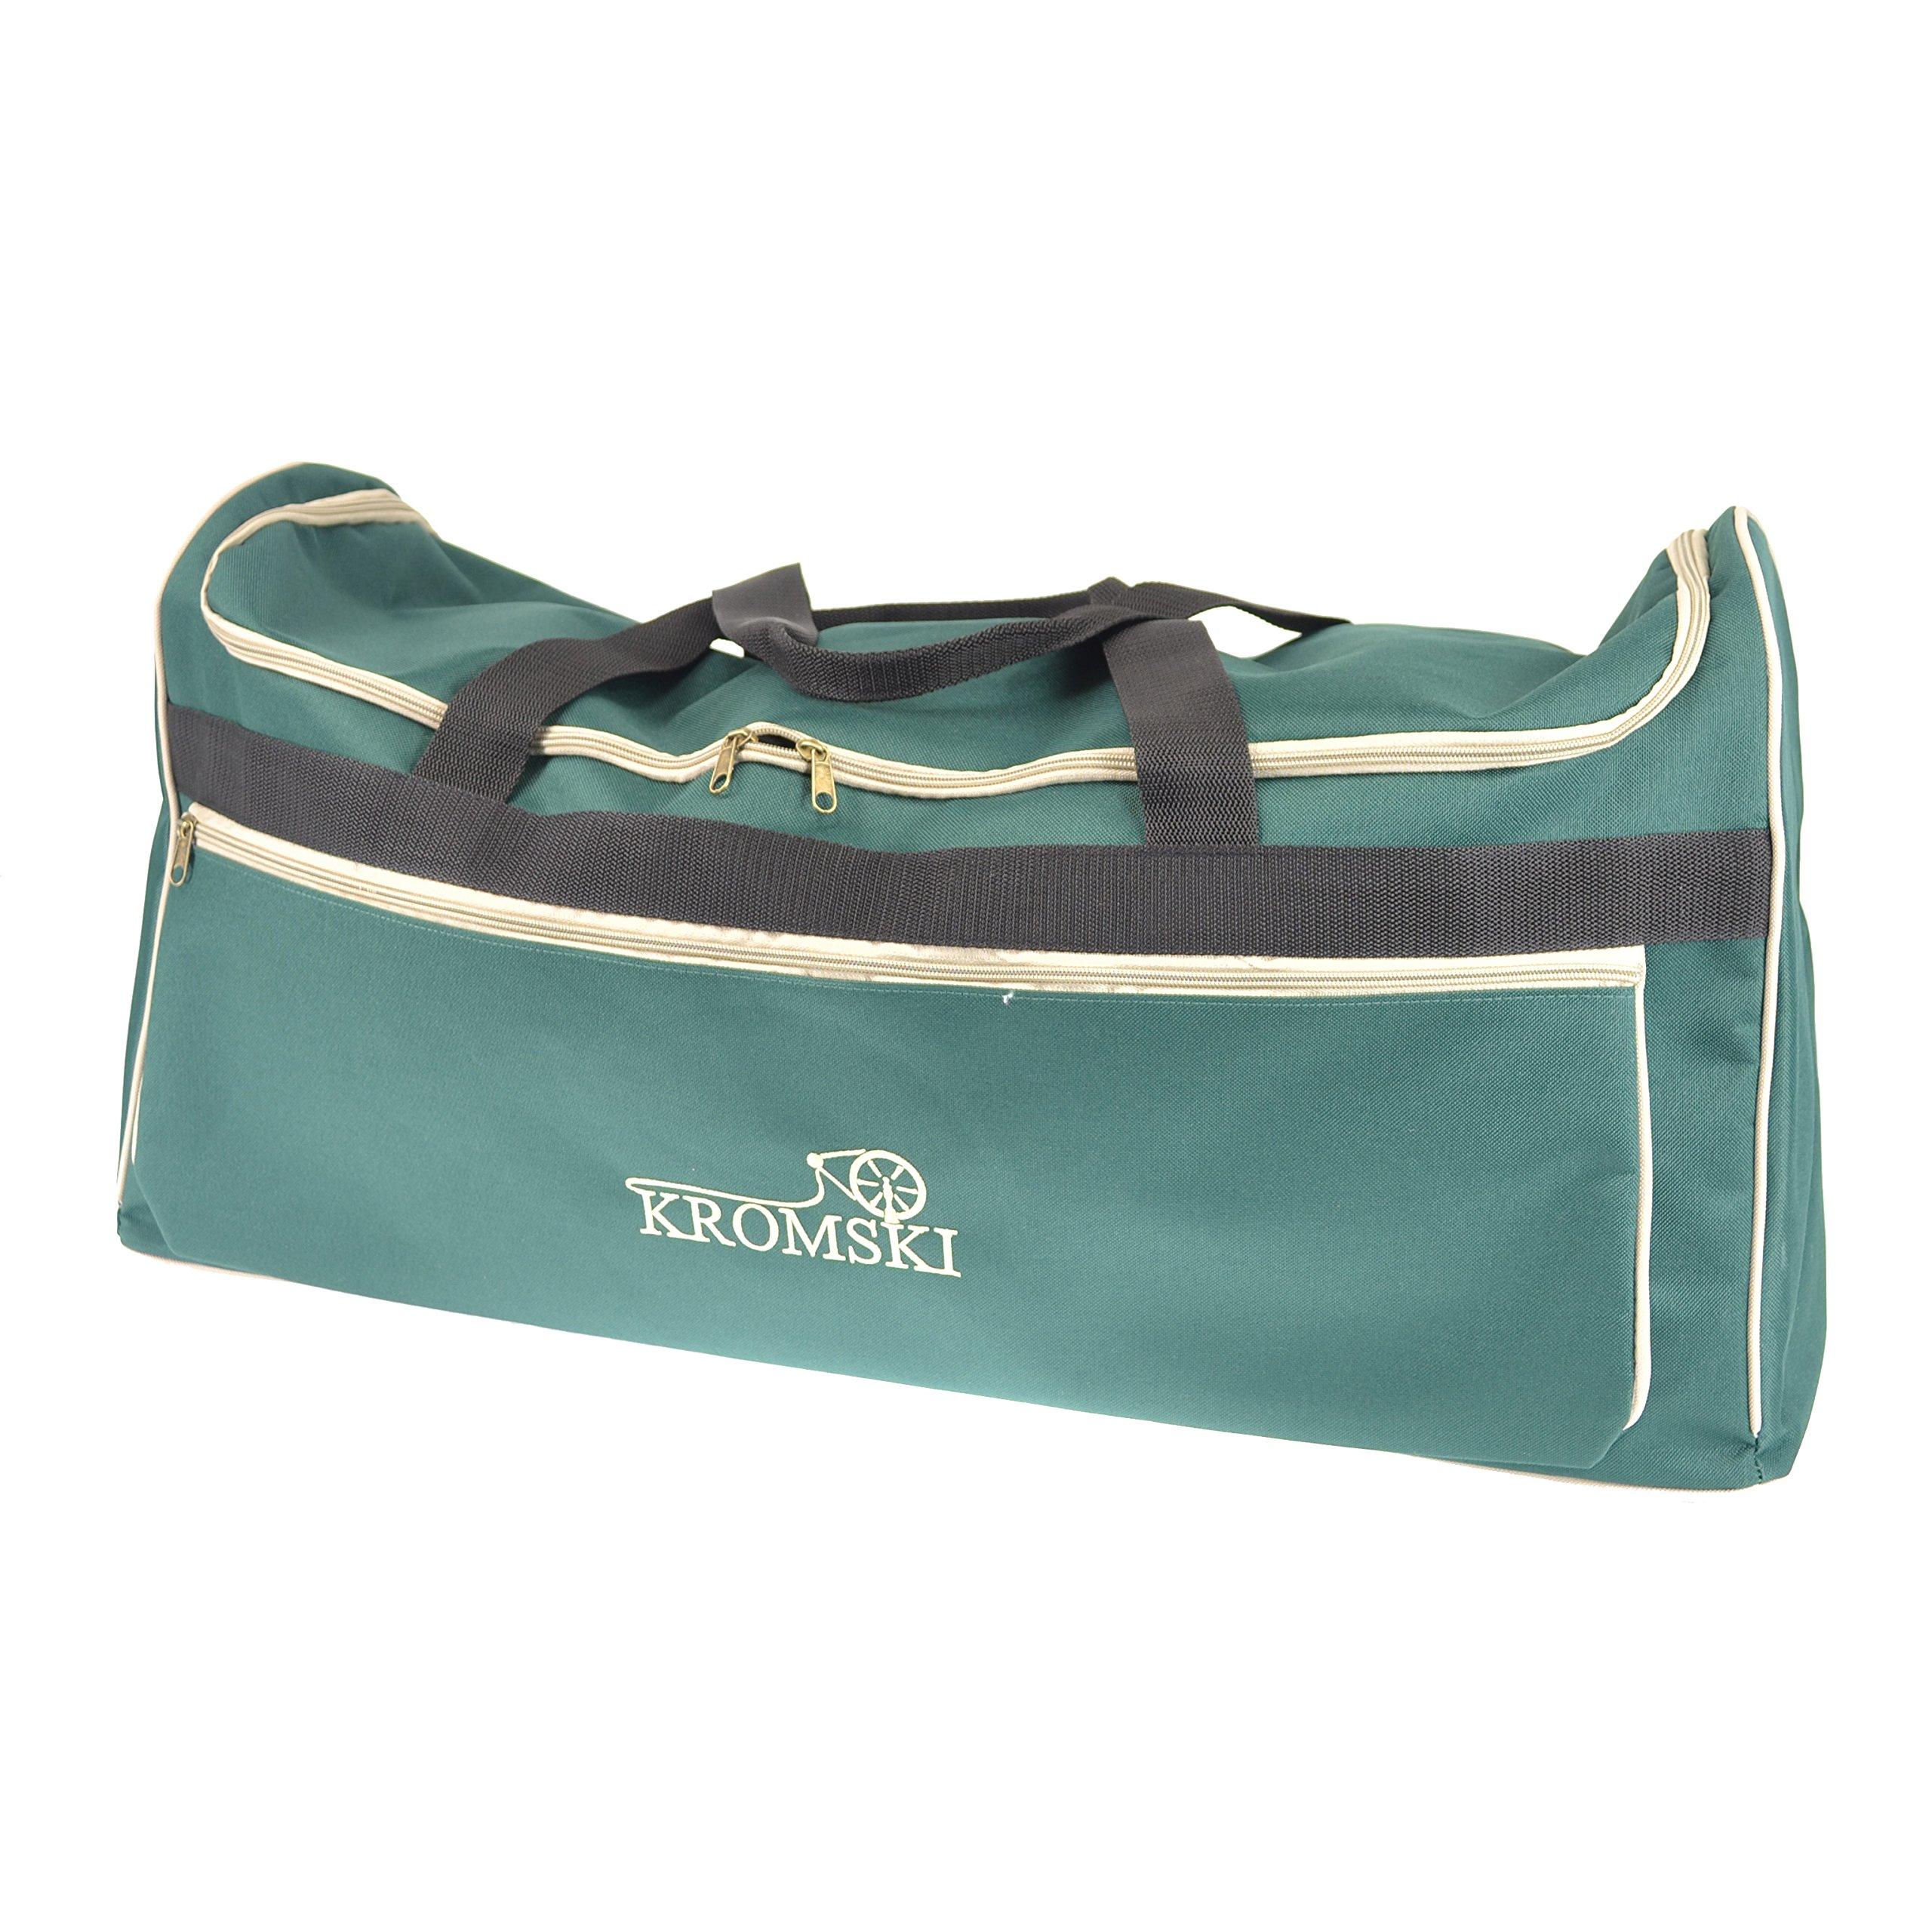 Kromski Harp Bag for 24'' Loom